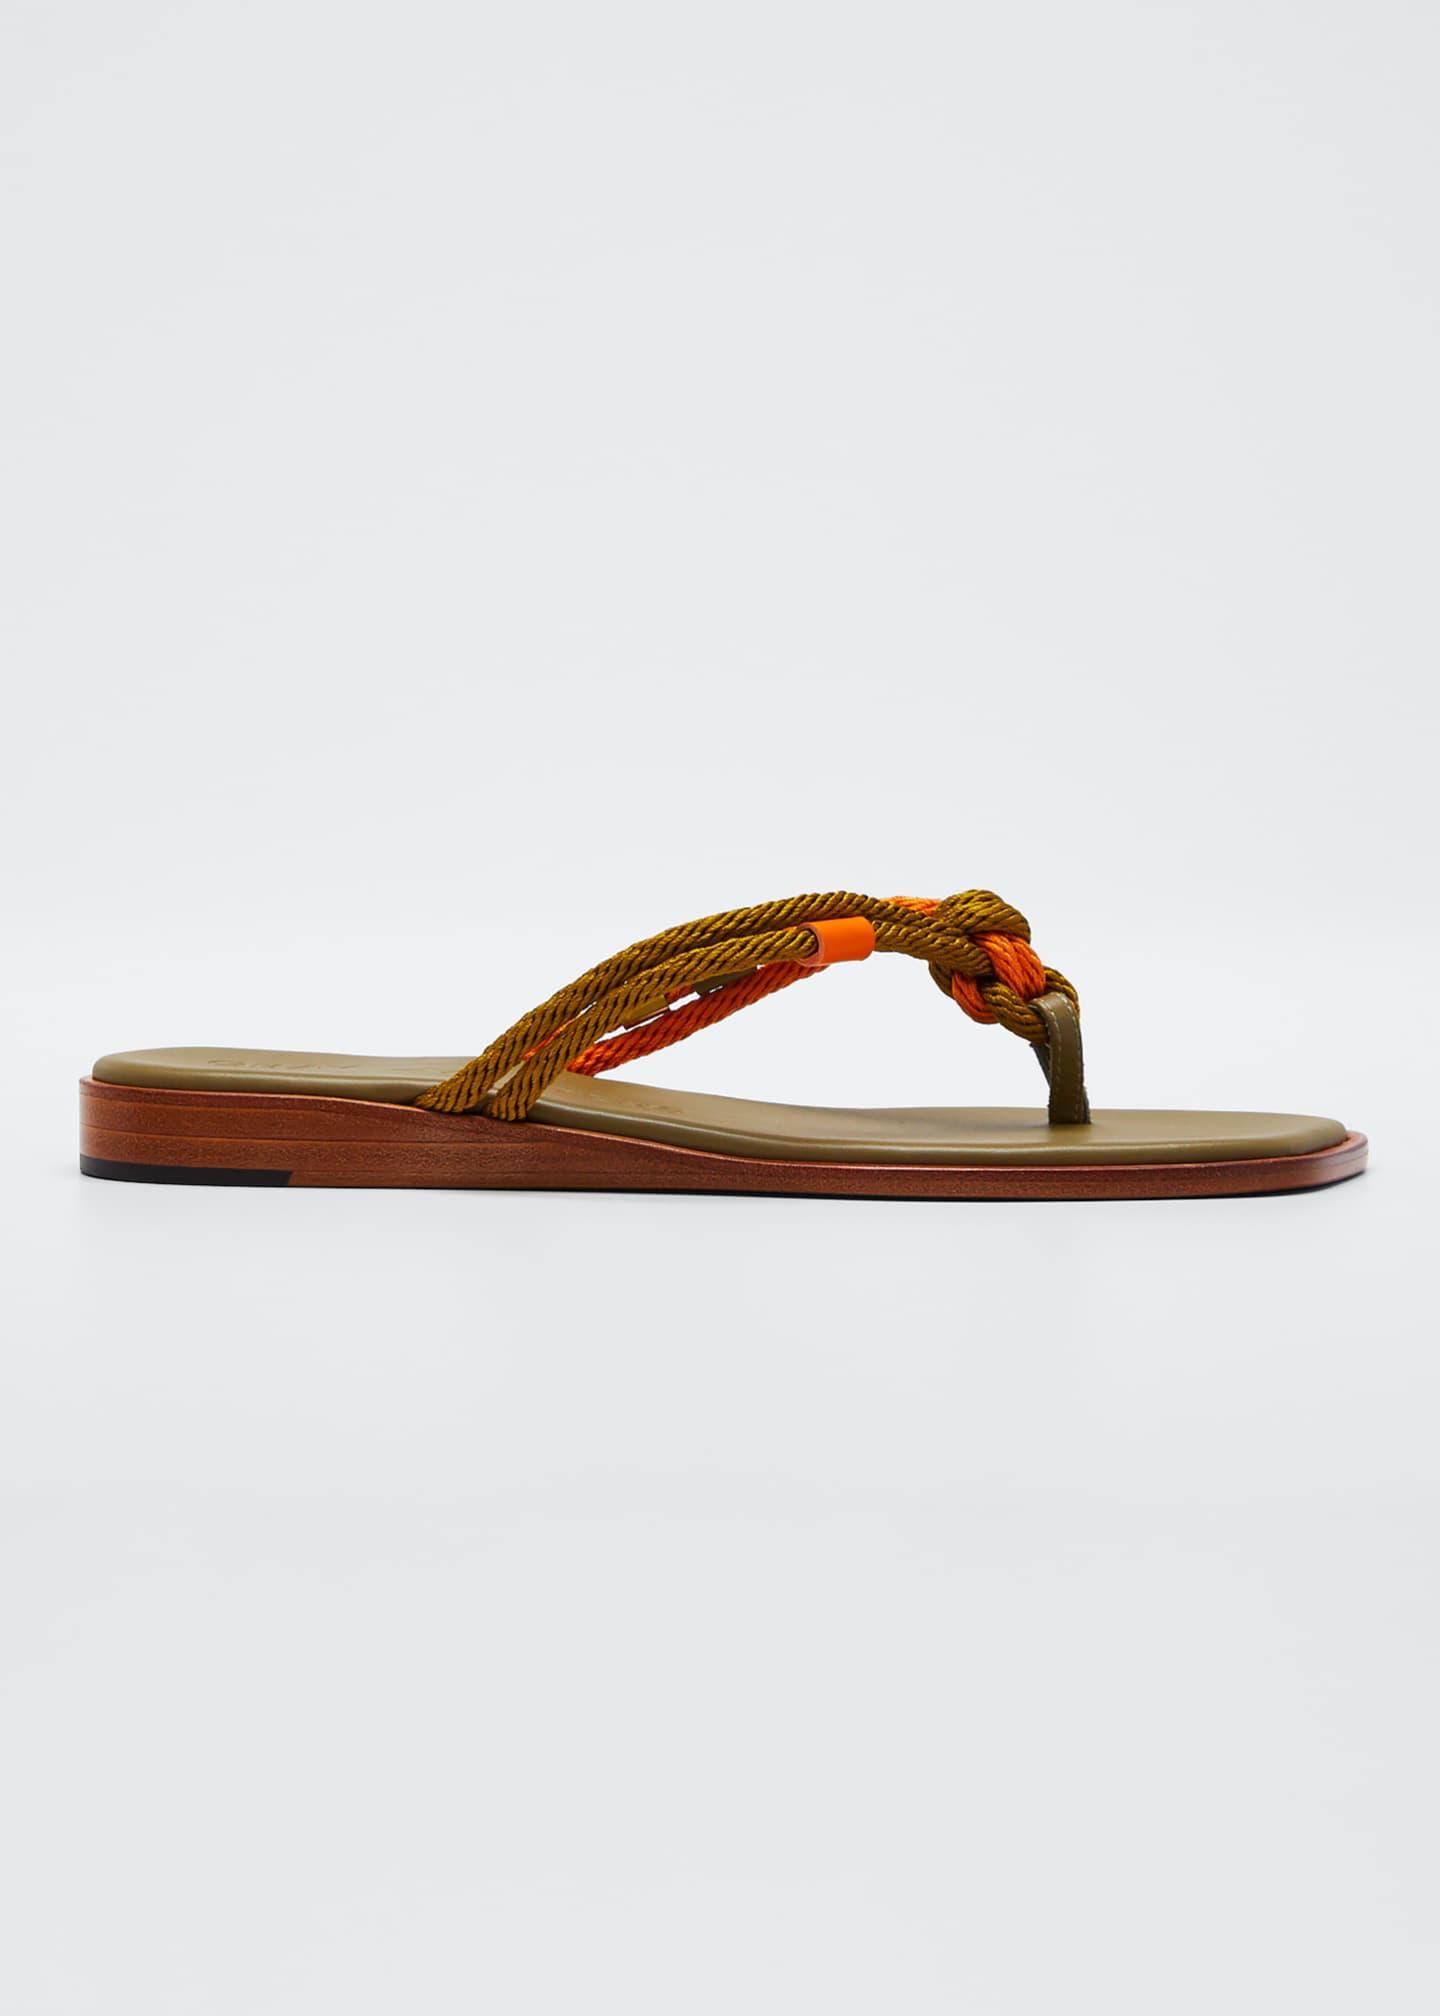 Gray Matters Corda Flip-Flop Slide Sandals